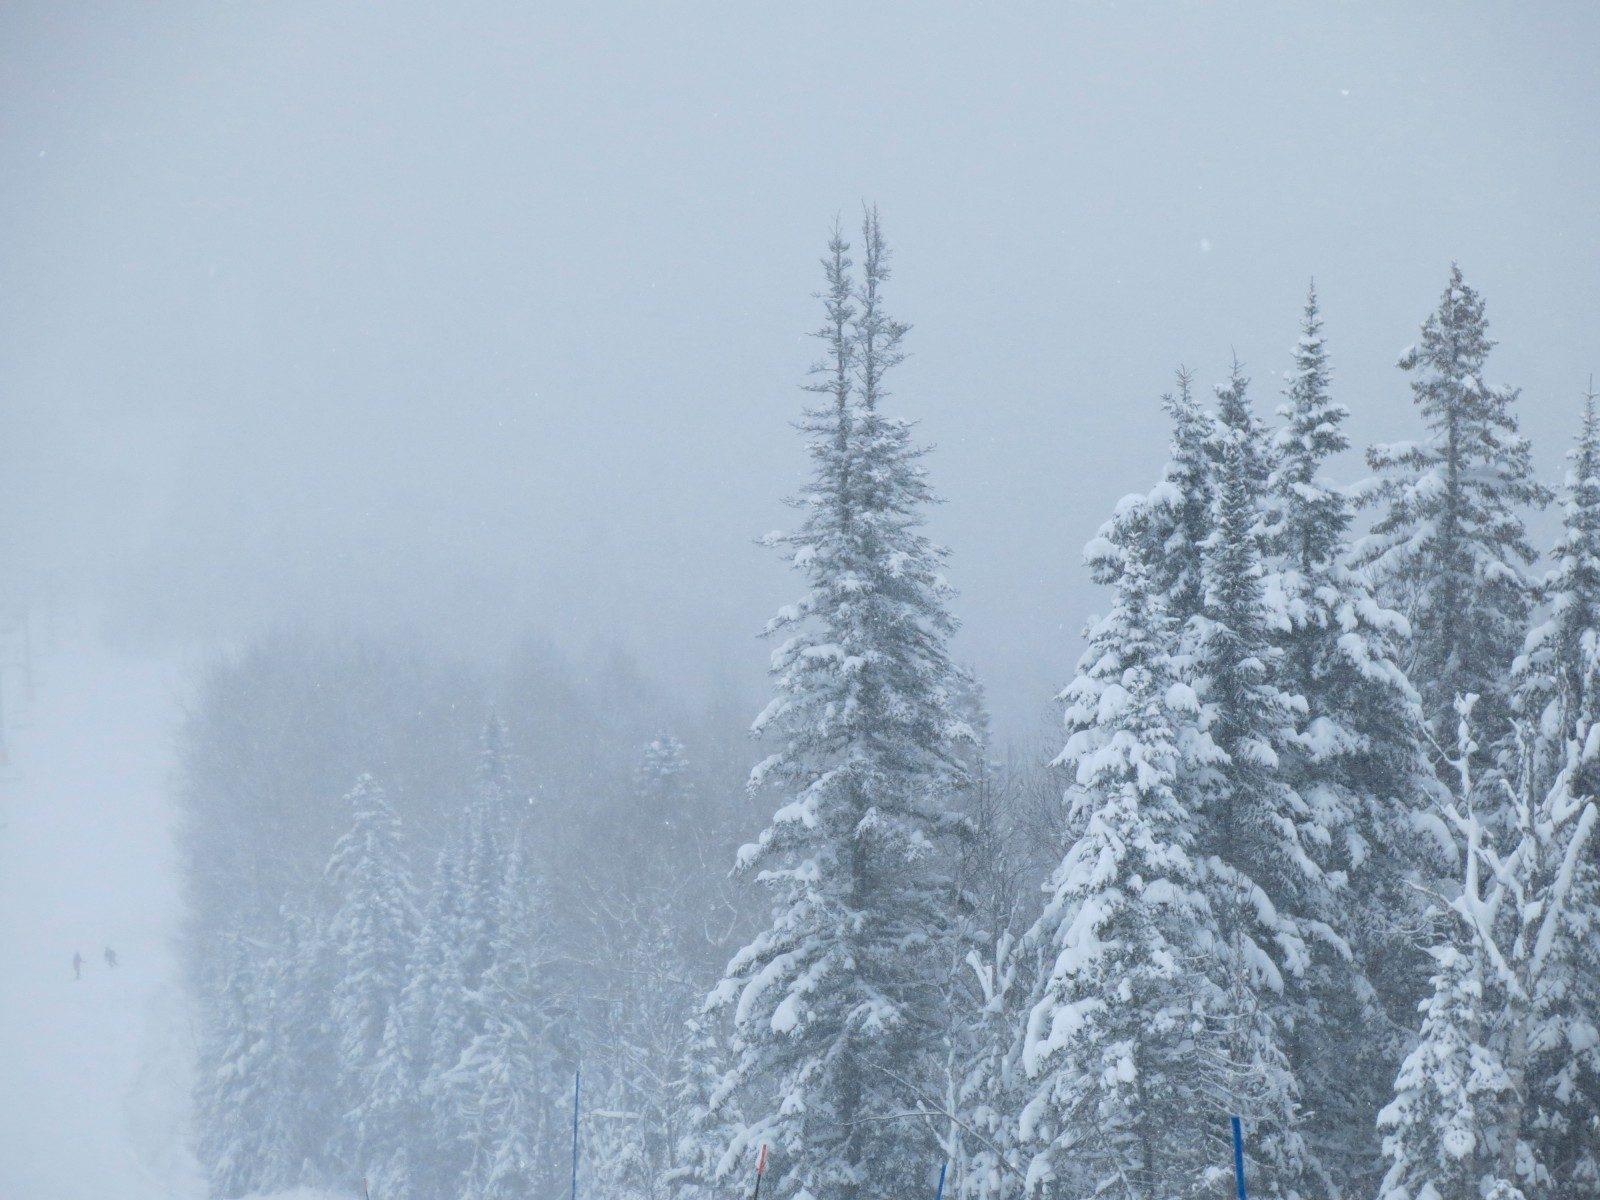 La première bordée de neige tombera mardi le 12 novembre